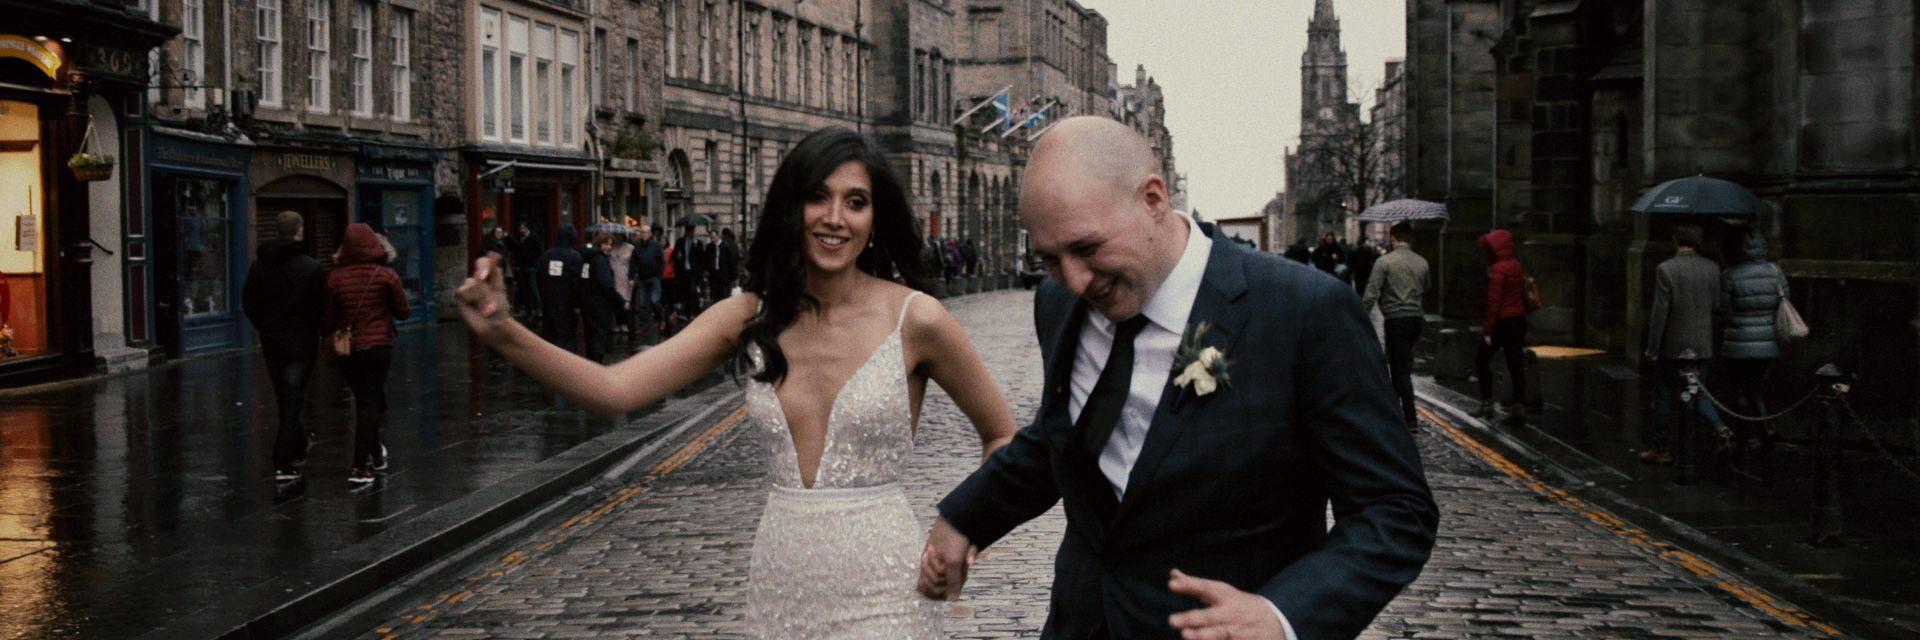 Malaga-wedding-videographer-cinemate-films-04